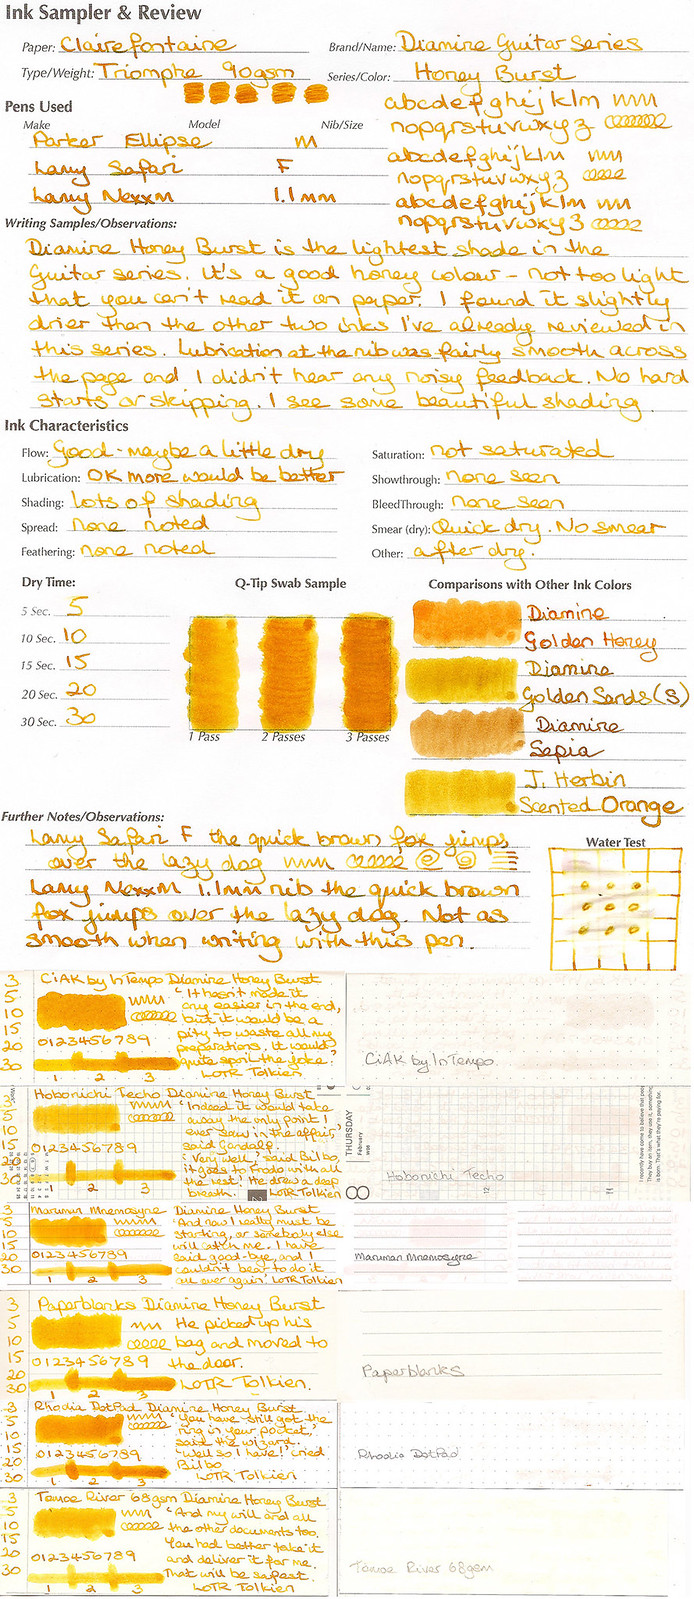 Diamine Honey Burst 1